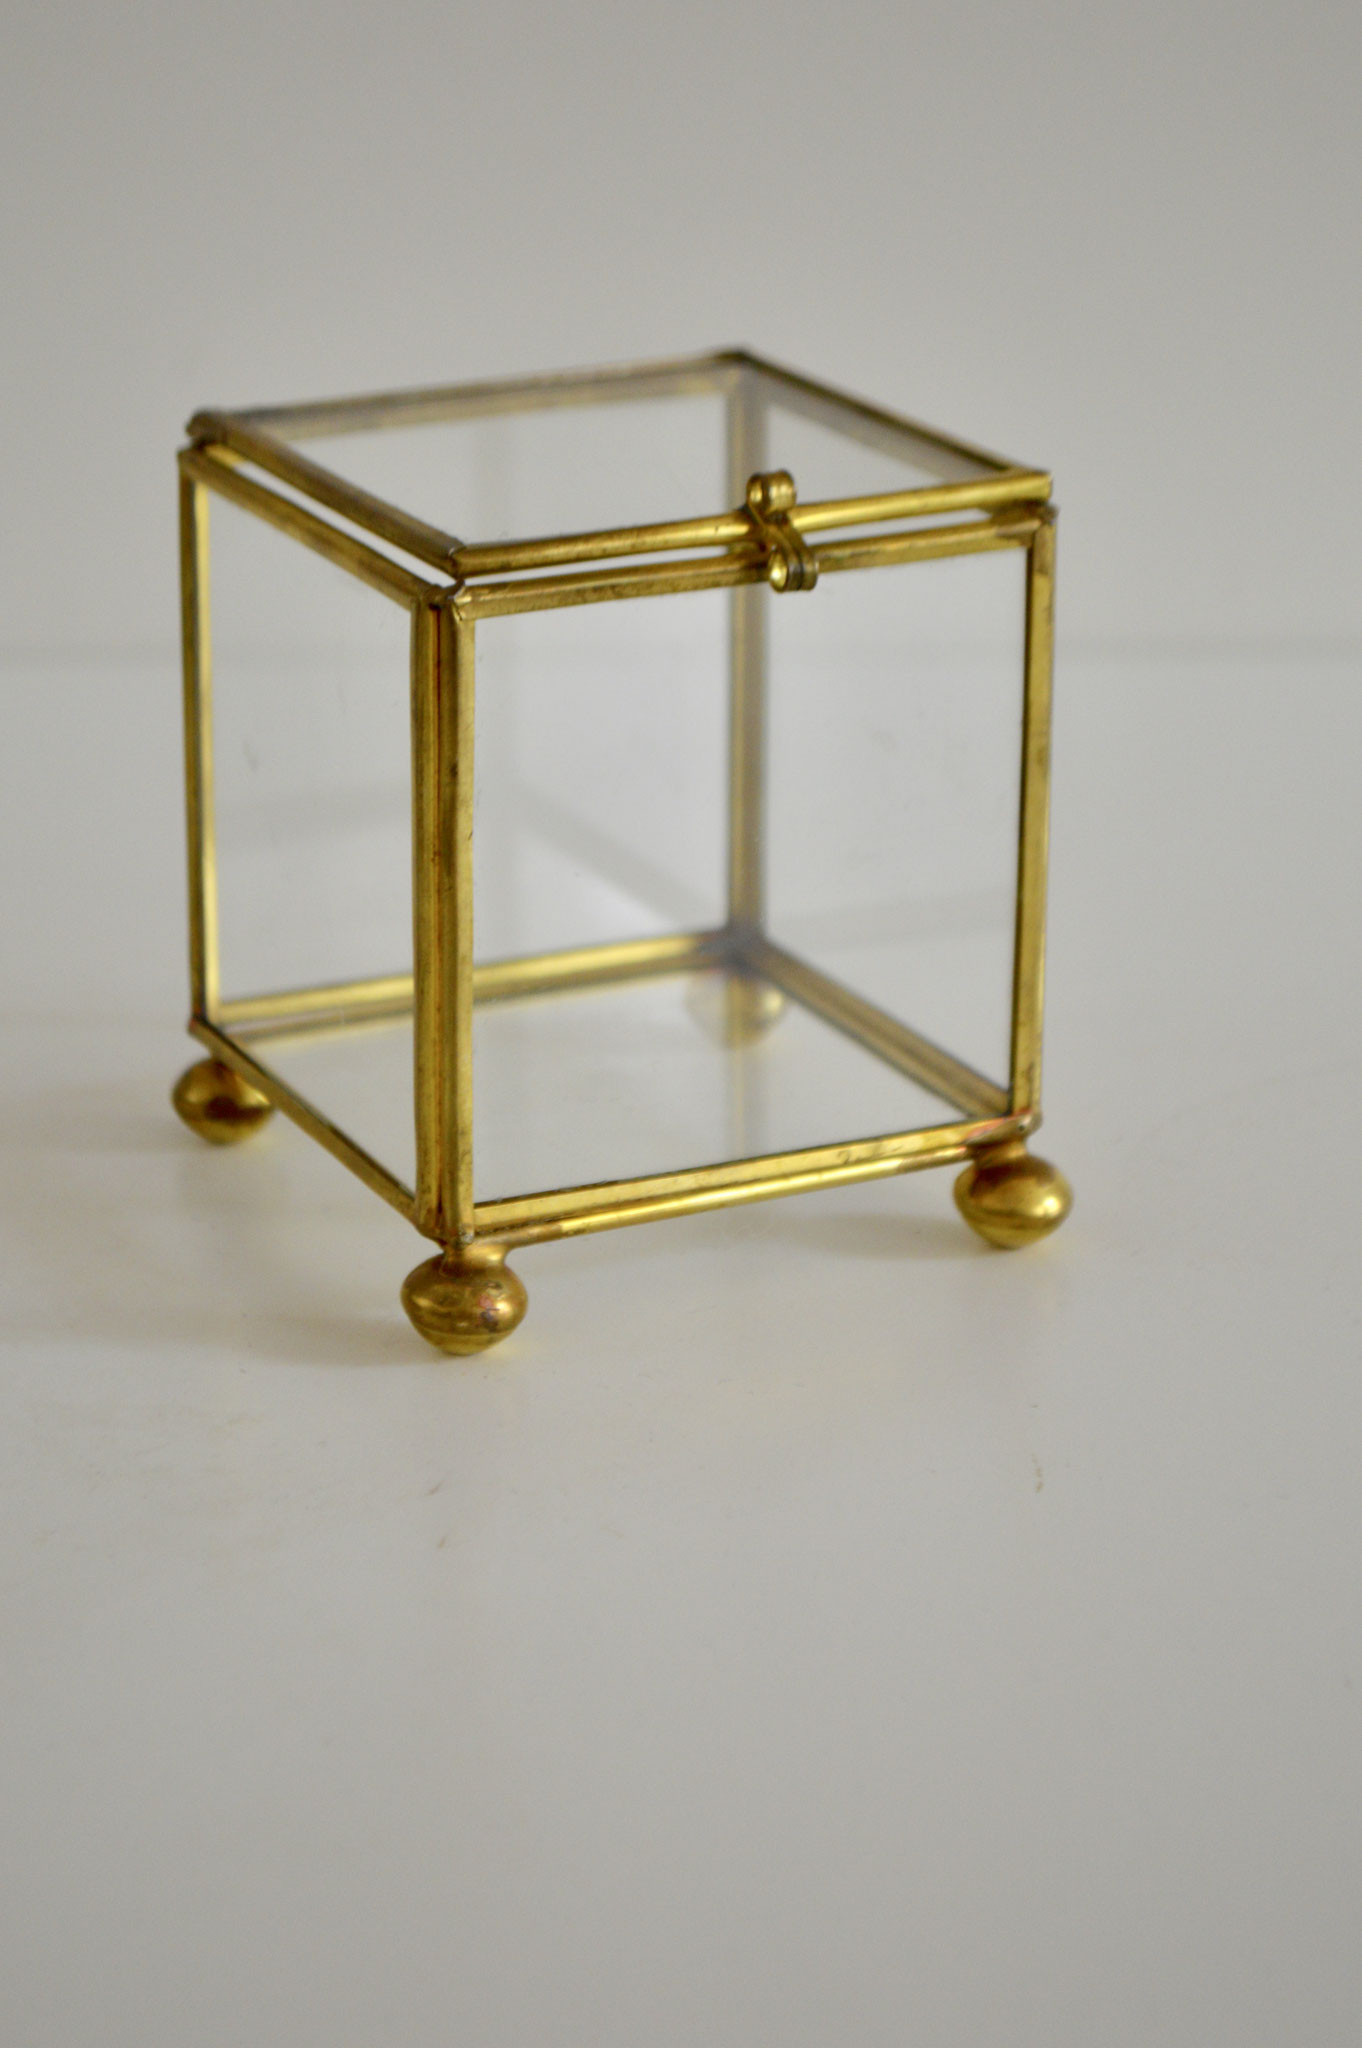 G) € 4, Höhe ca. 9 cm, Breite ca.  7,5 cm und Tiefe ca. 7,5 cm